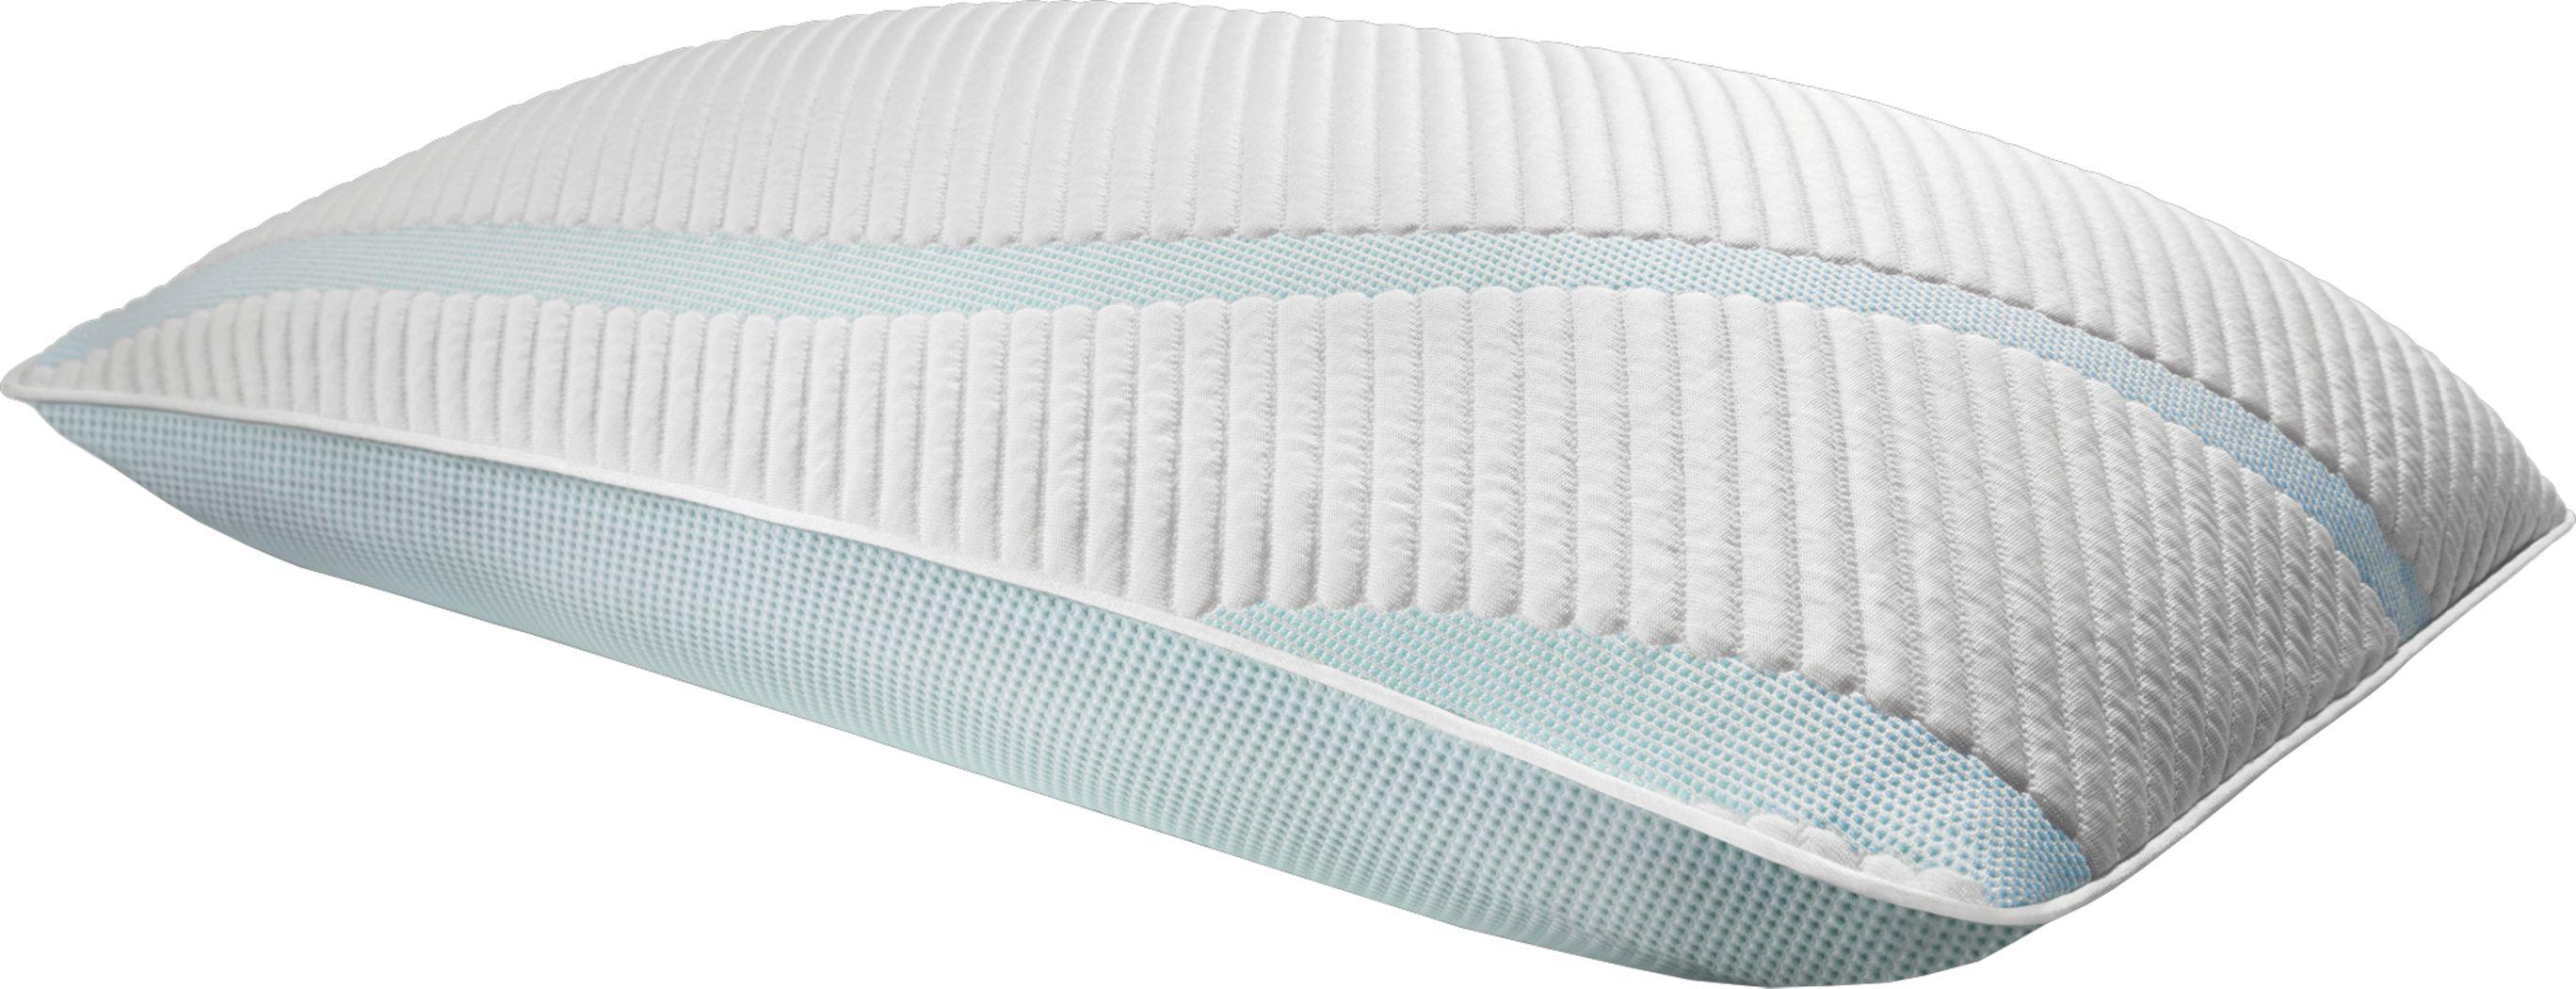 TEMPUR-Adapt Pro-Mid Standard Pillow